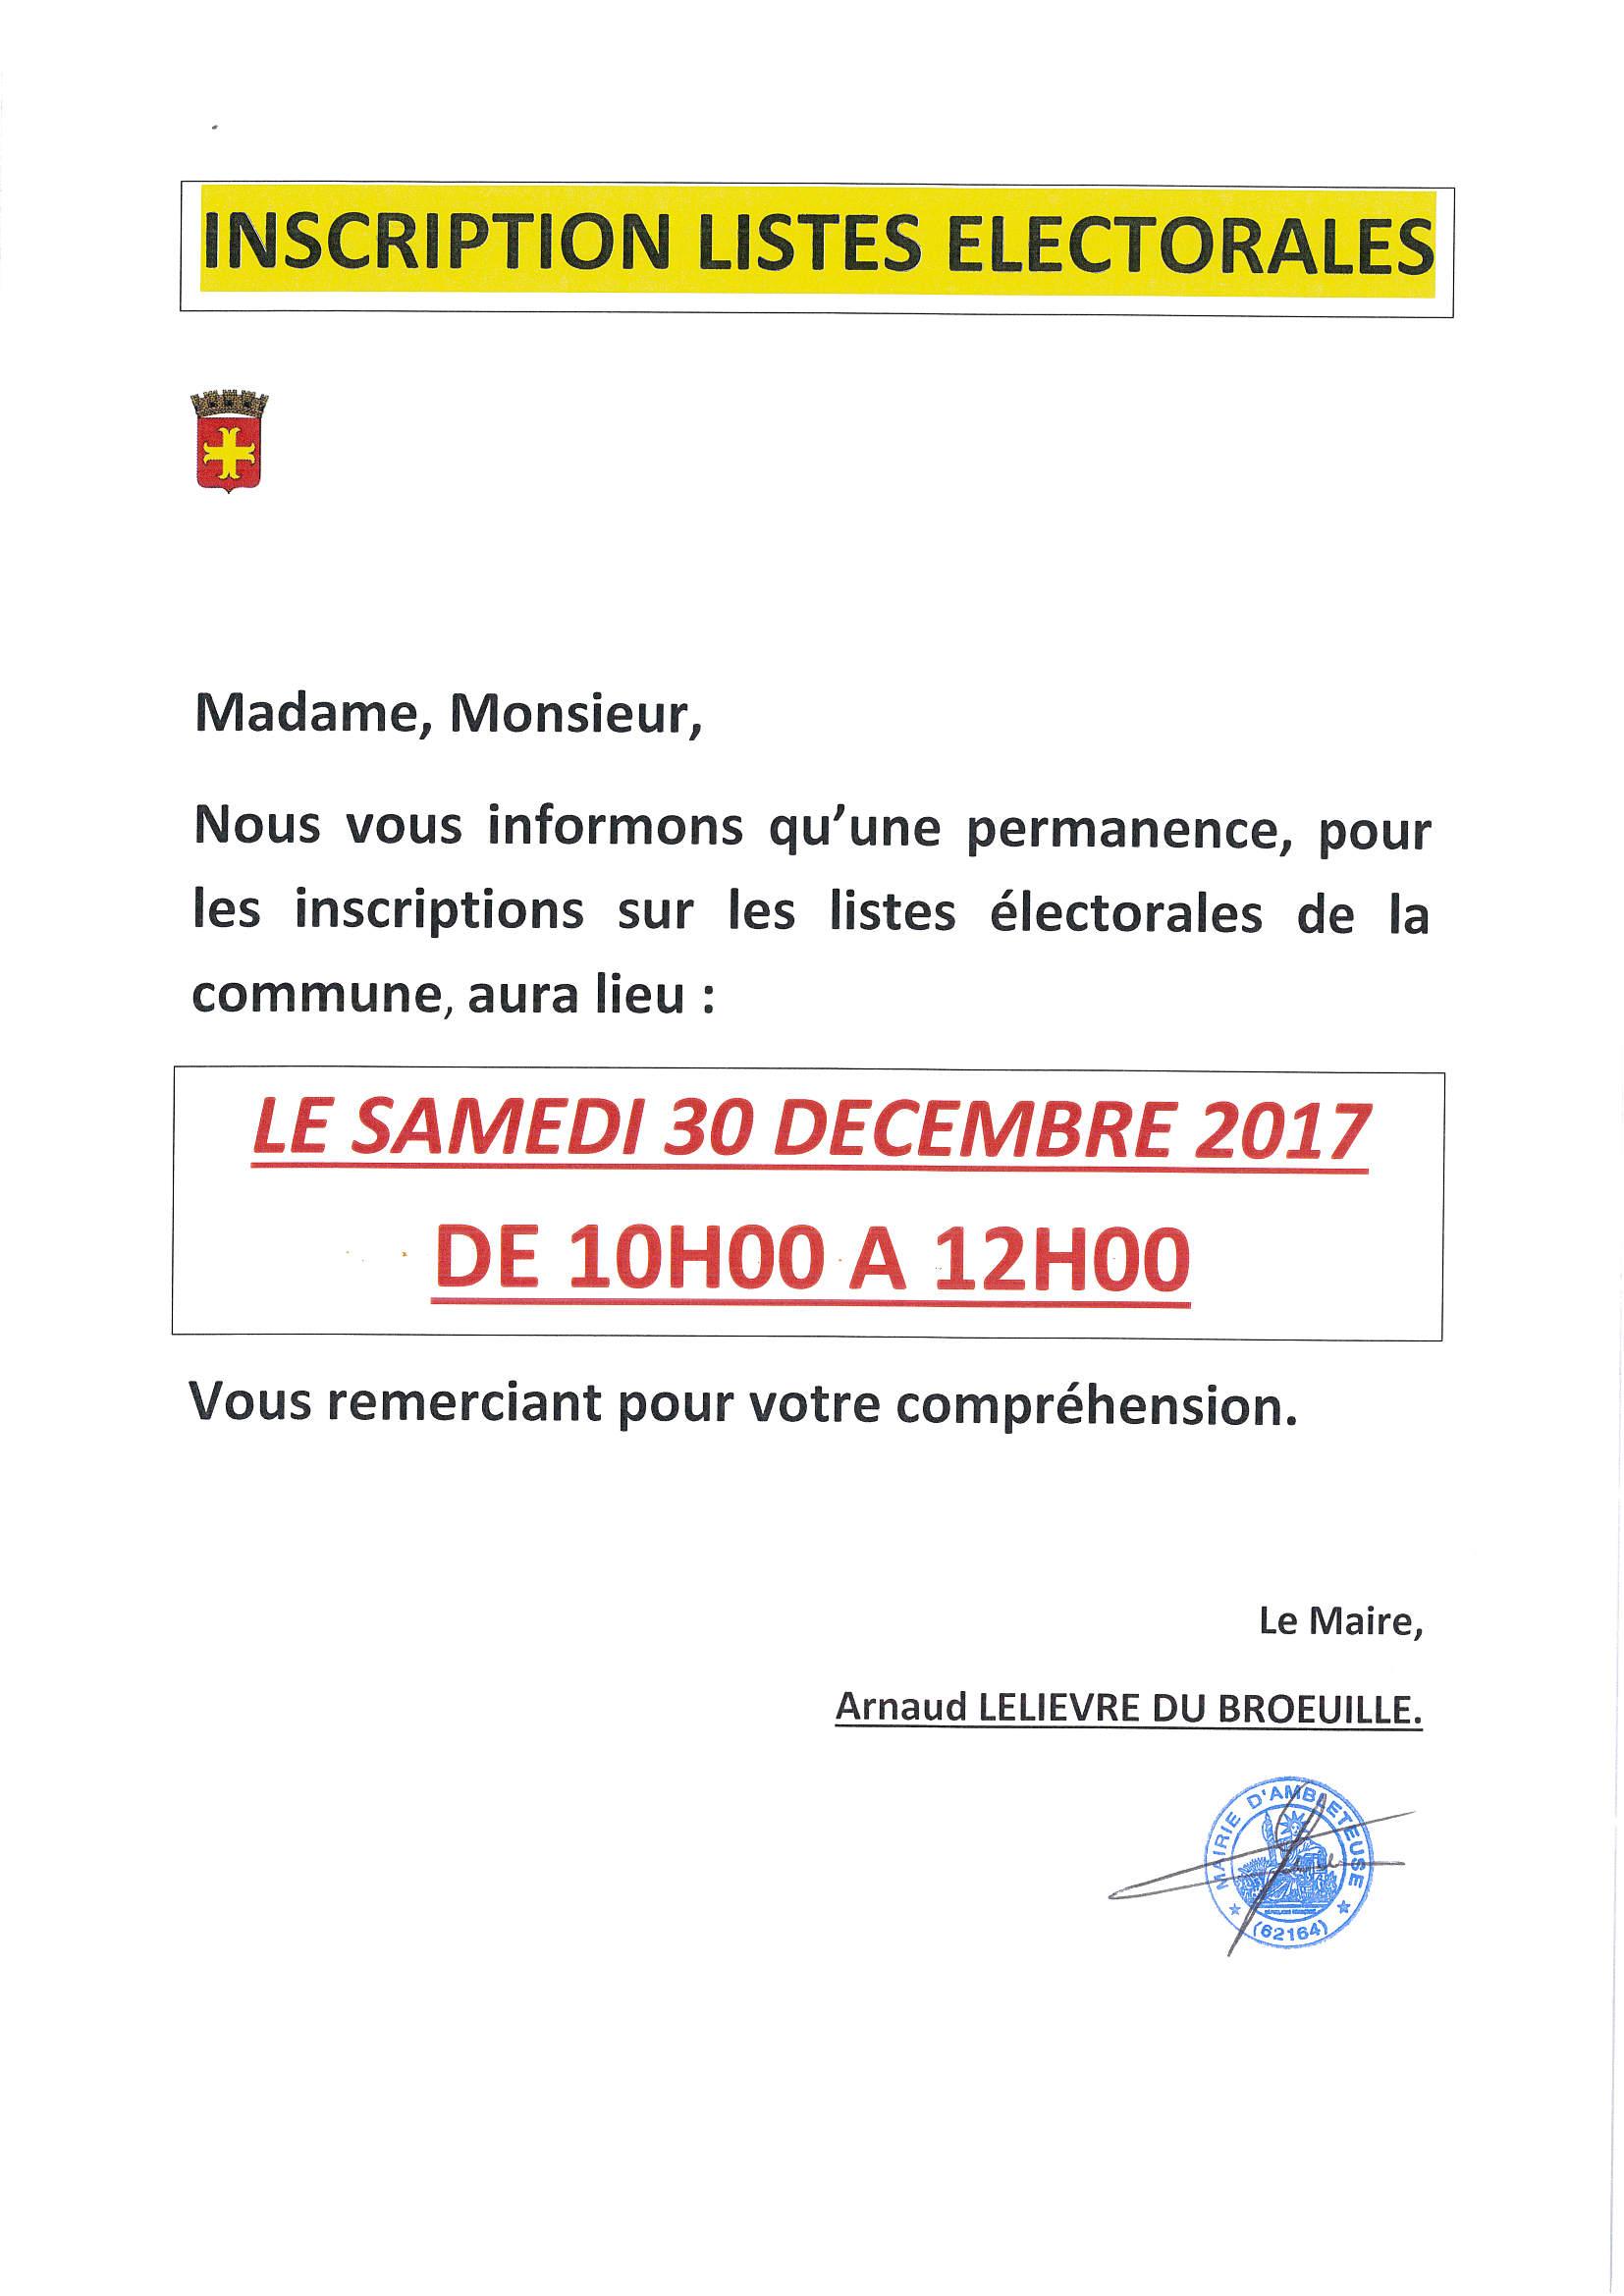 liste electorale_001.jpg